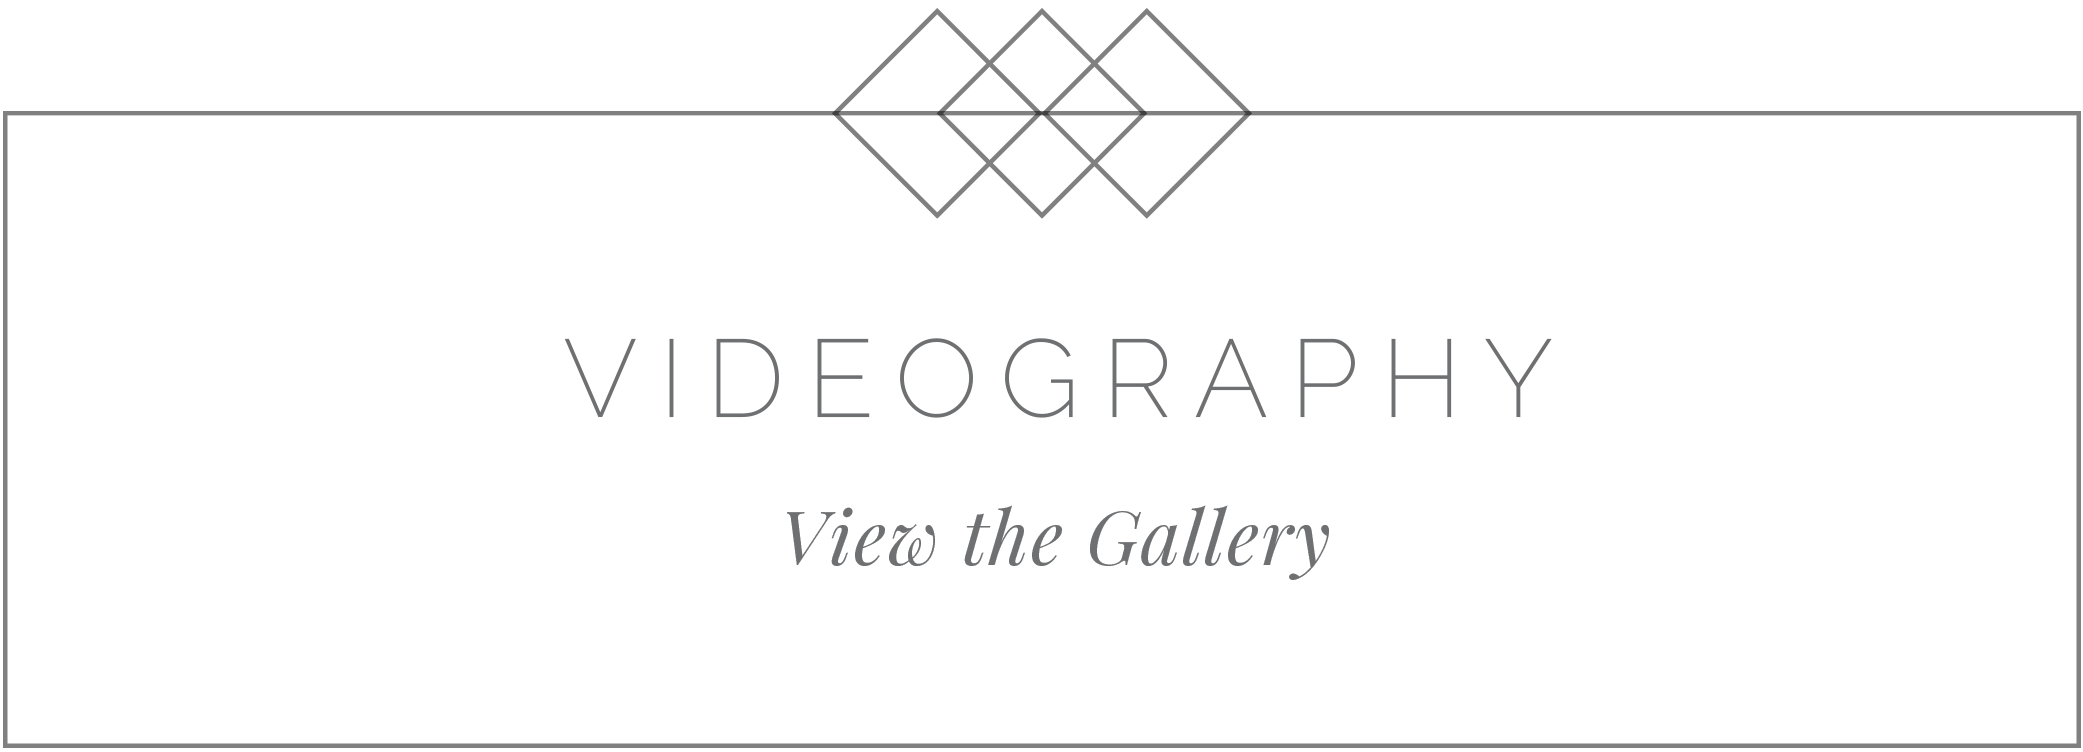 VideographyButton.png